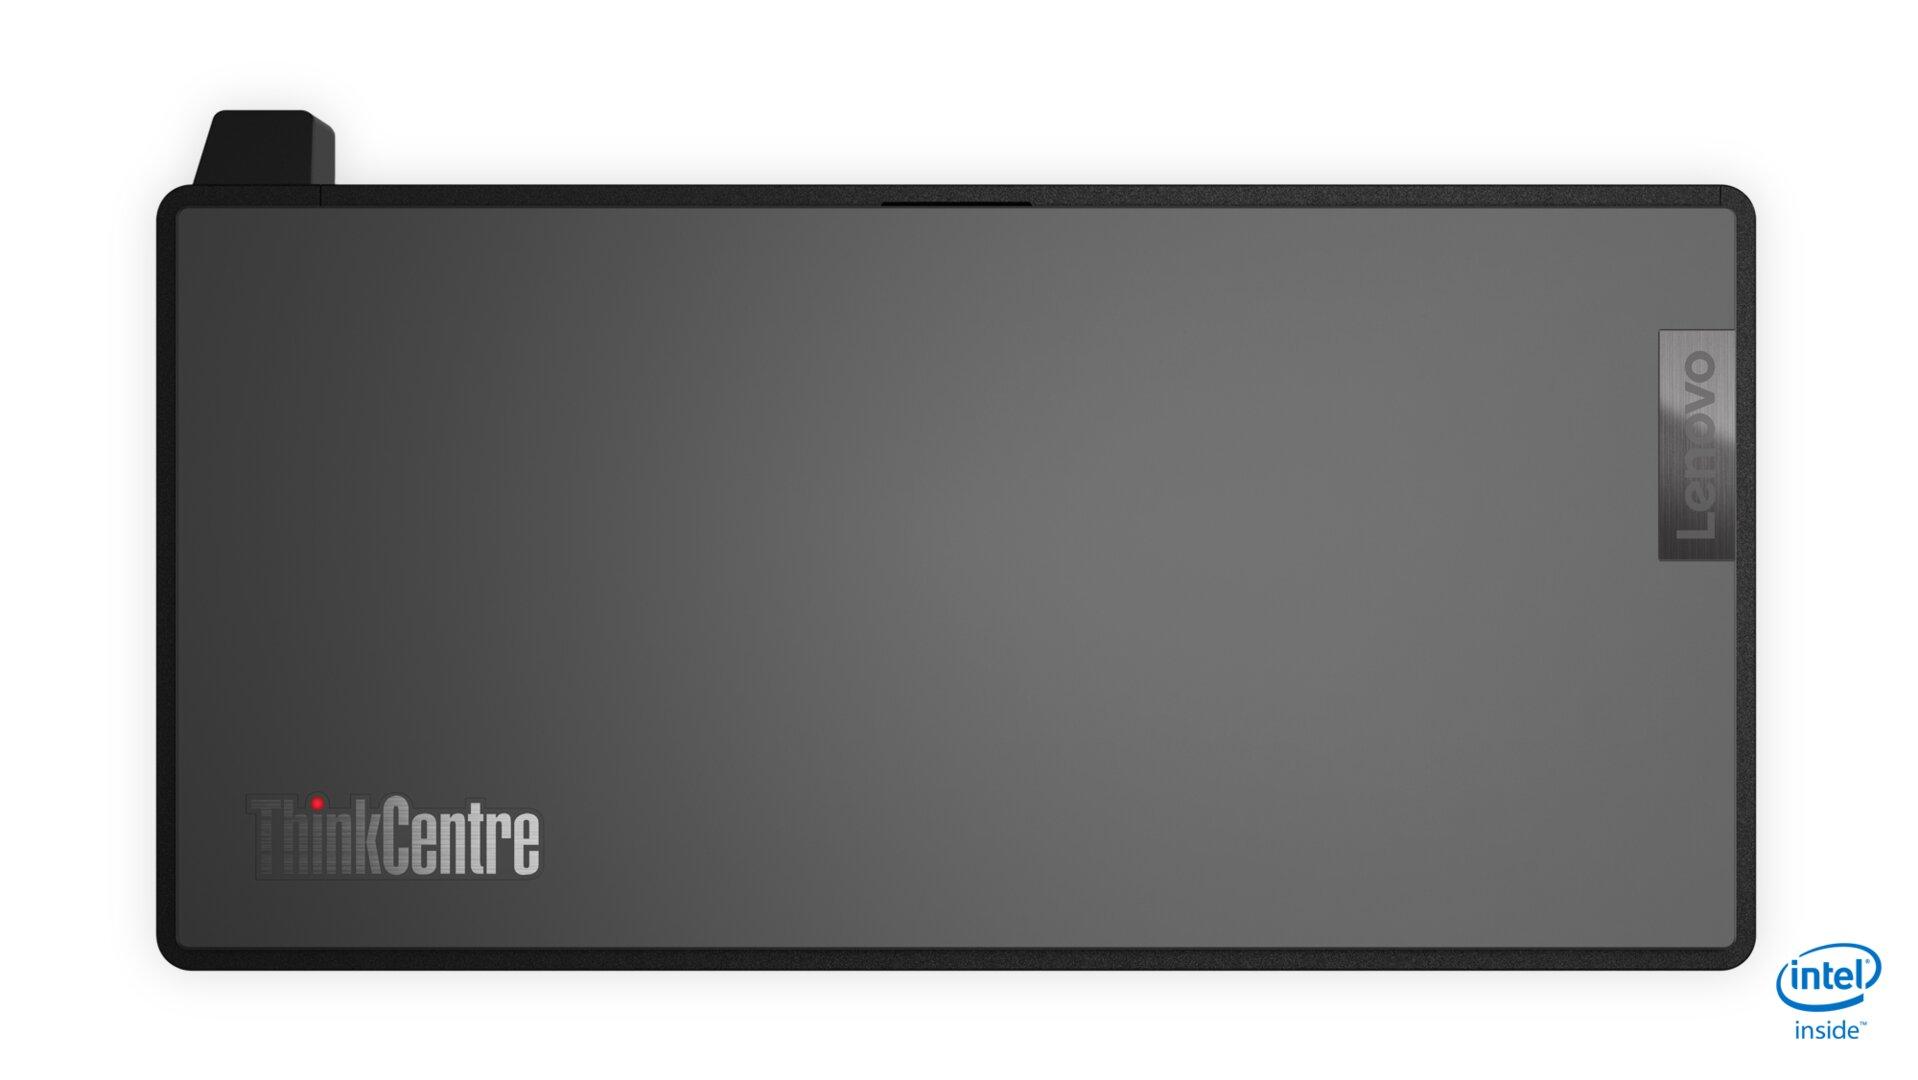 Lenovo ThinkCentre M90n Nano